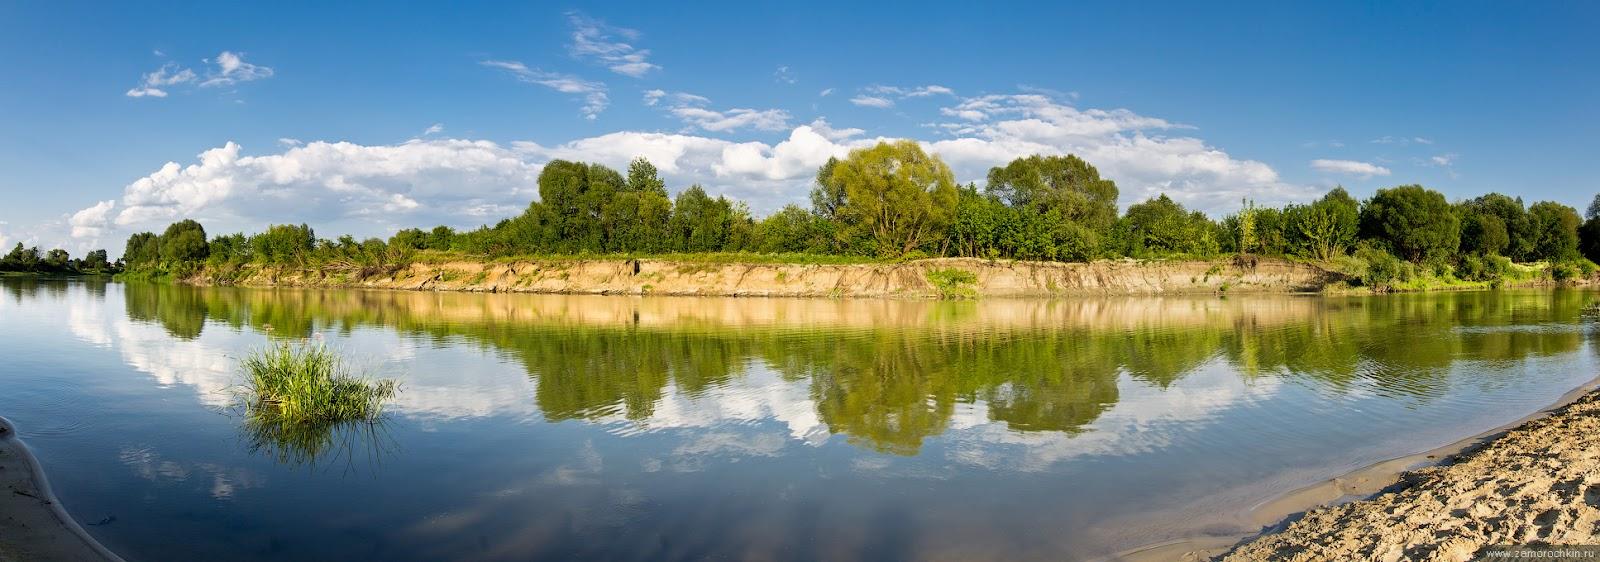 Панорама берега реки Мокша | Panorama of the river Moksha